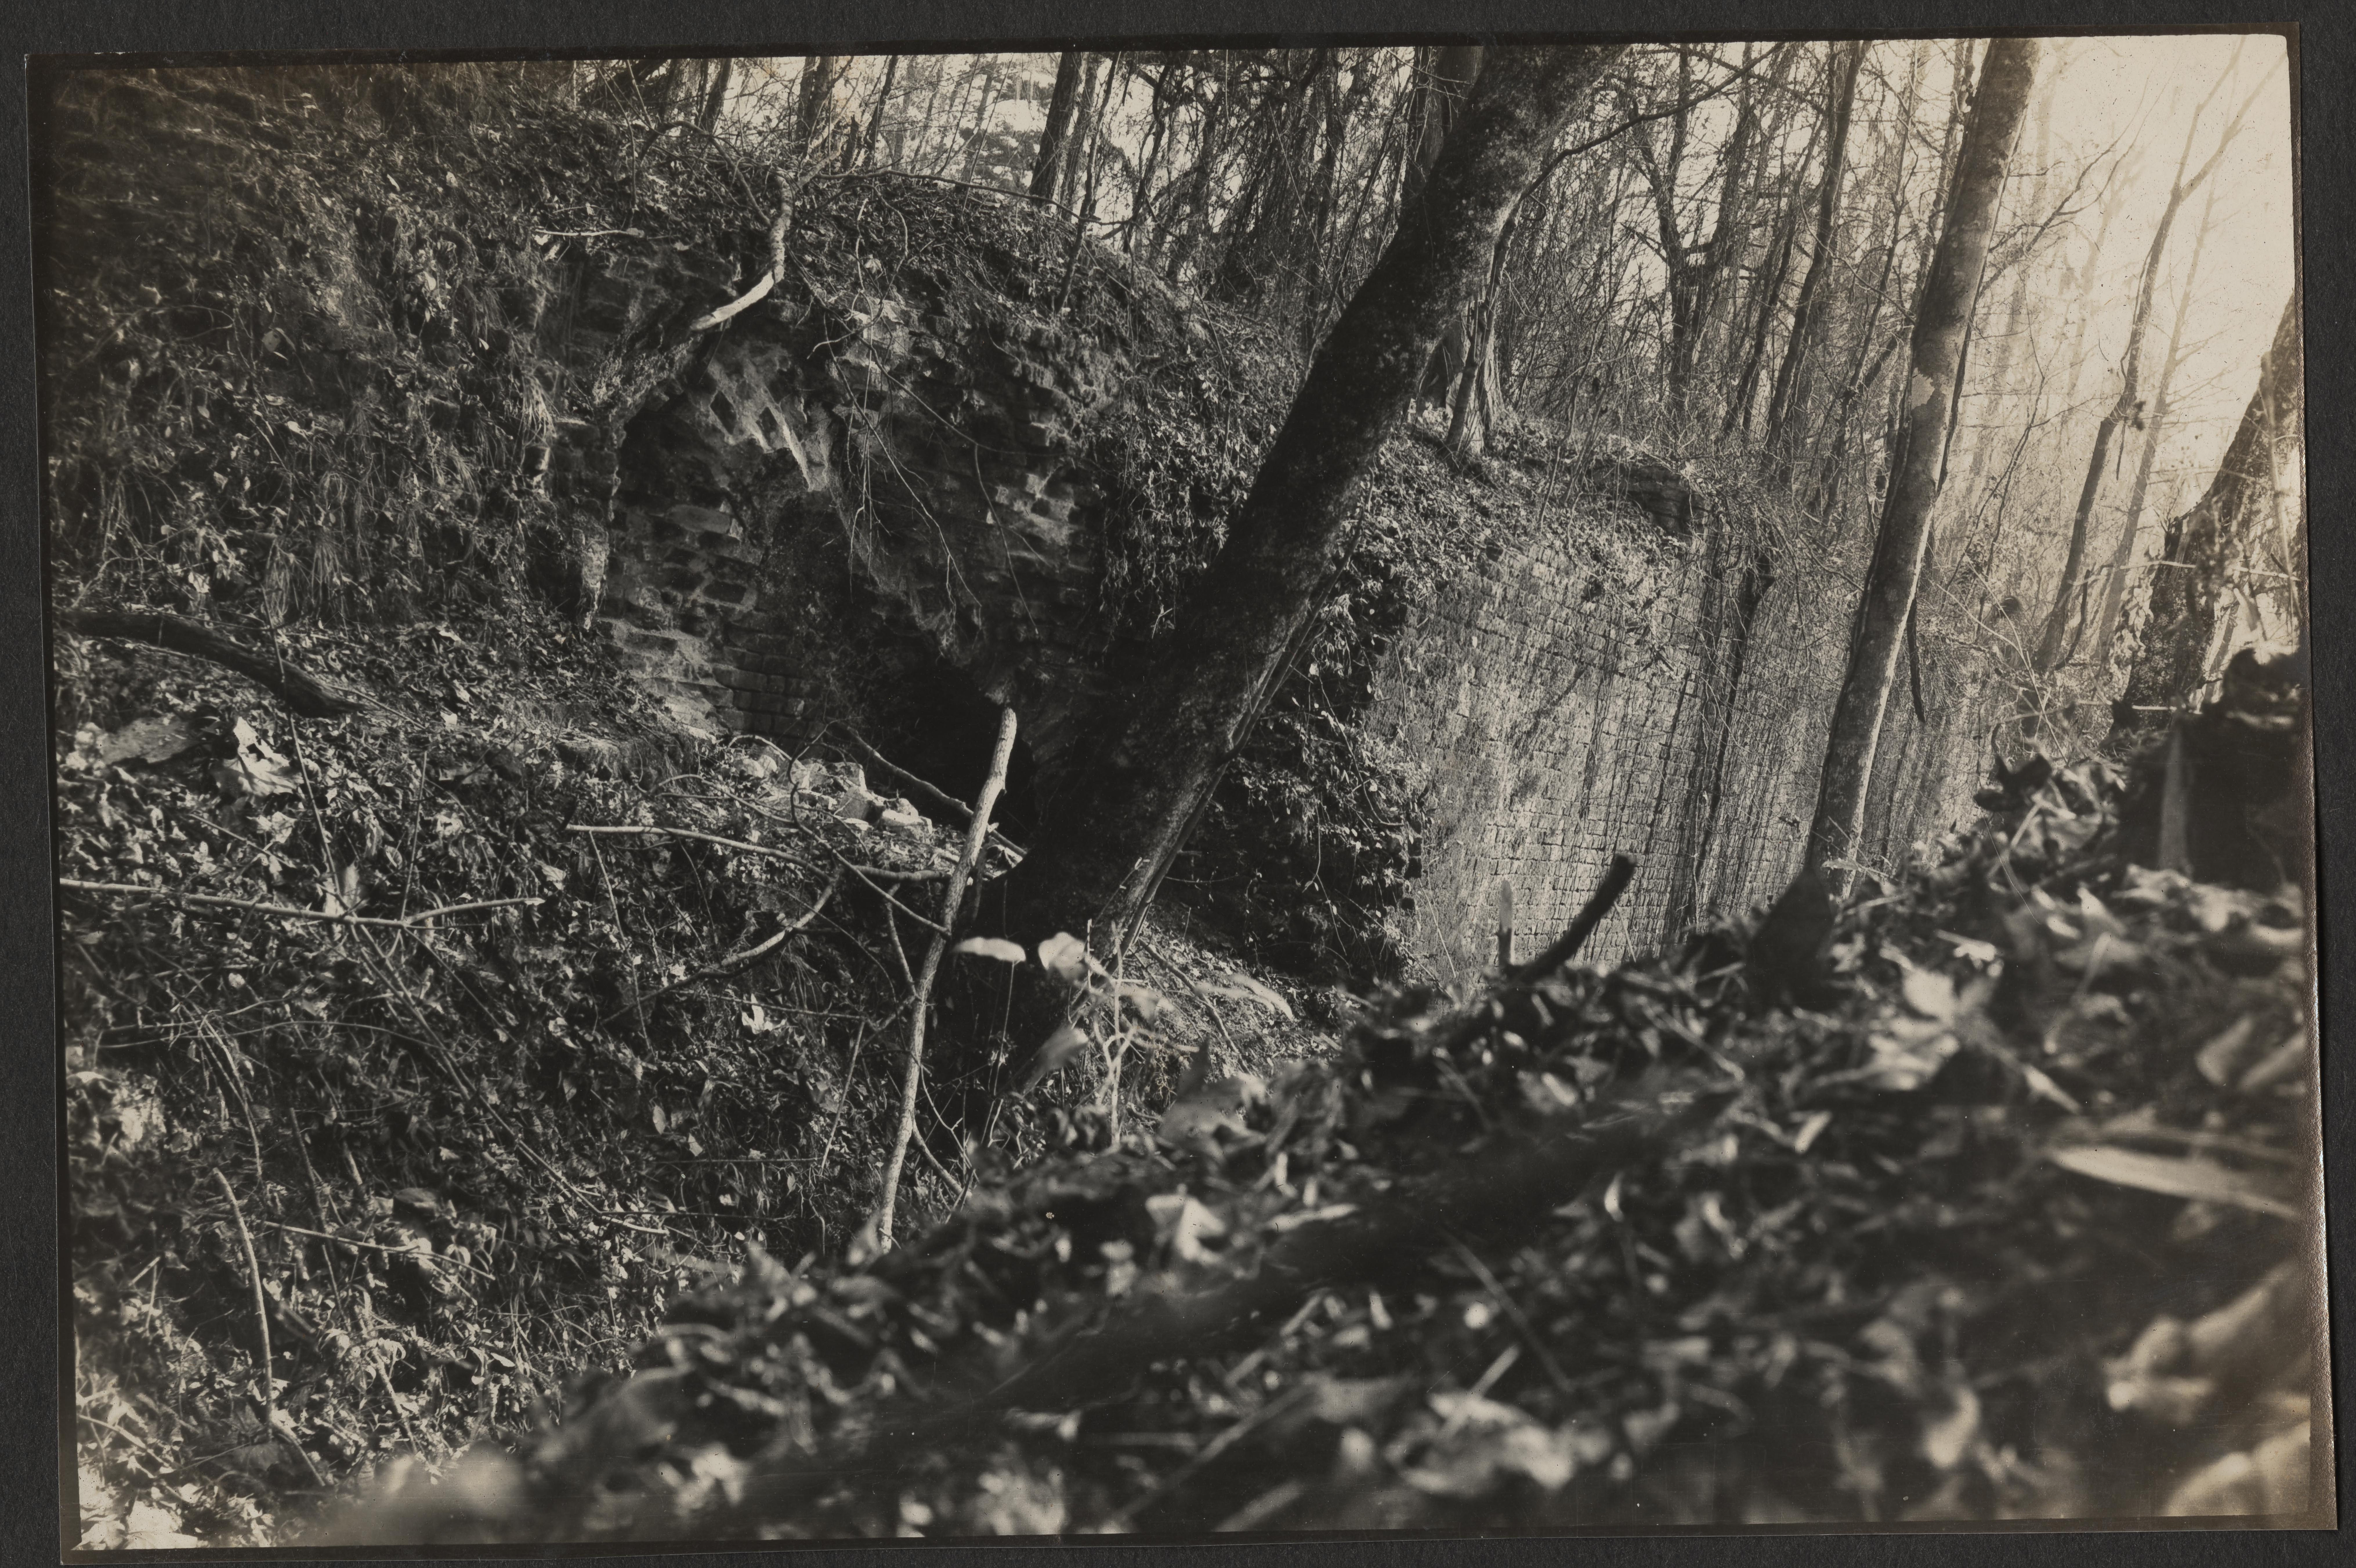 Santee-Cooper Cemetery Investigation 007